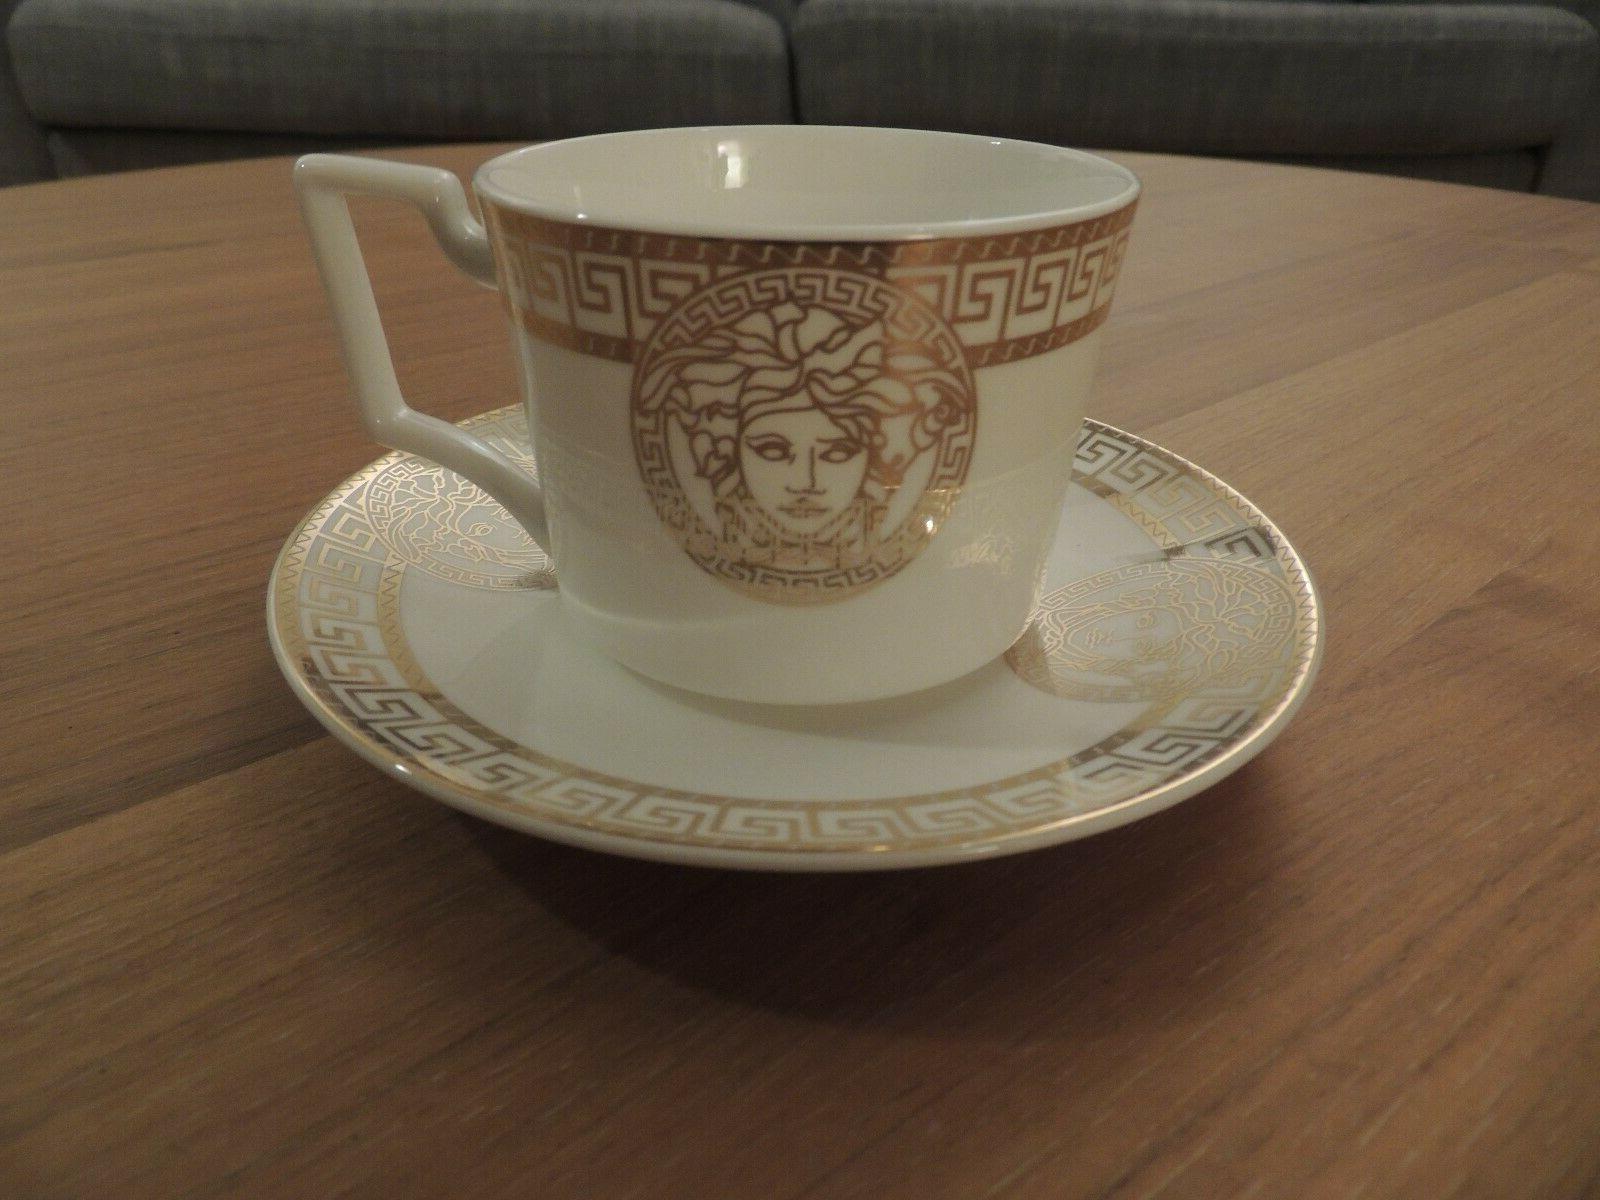 White; New SET of 6 Rosenthal DOUBLE ESPRESSO Mugs